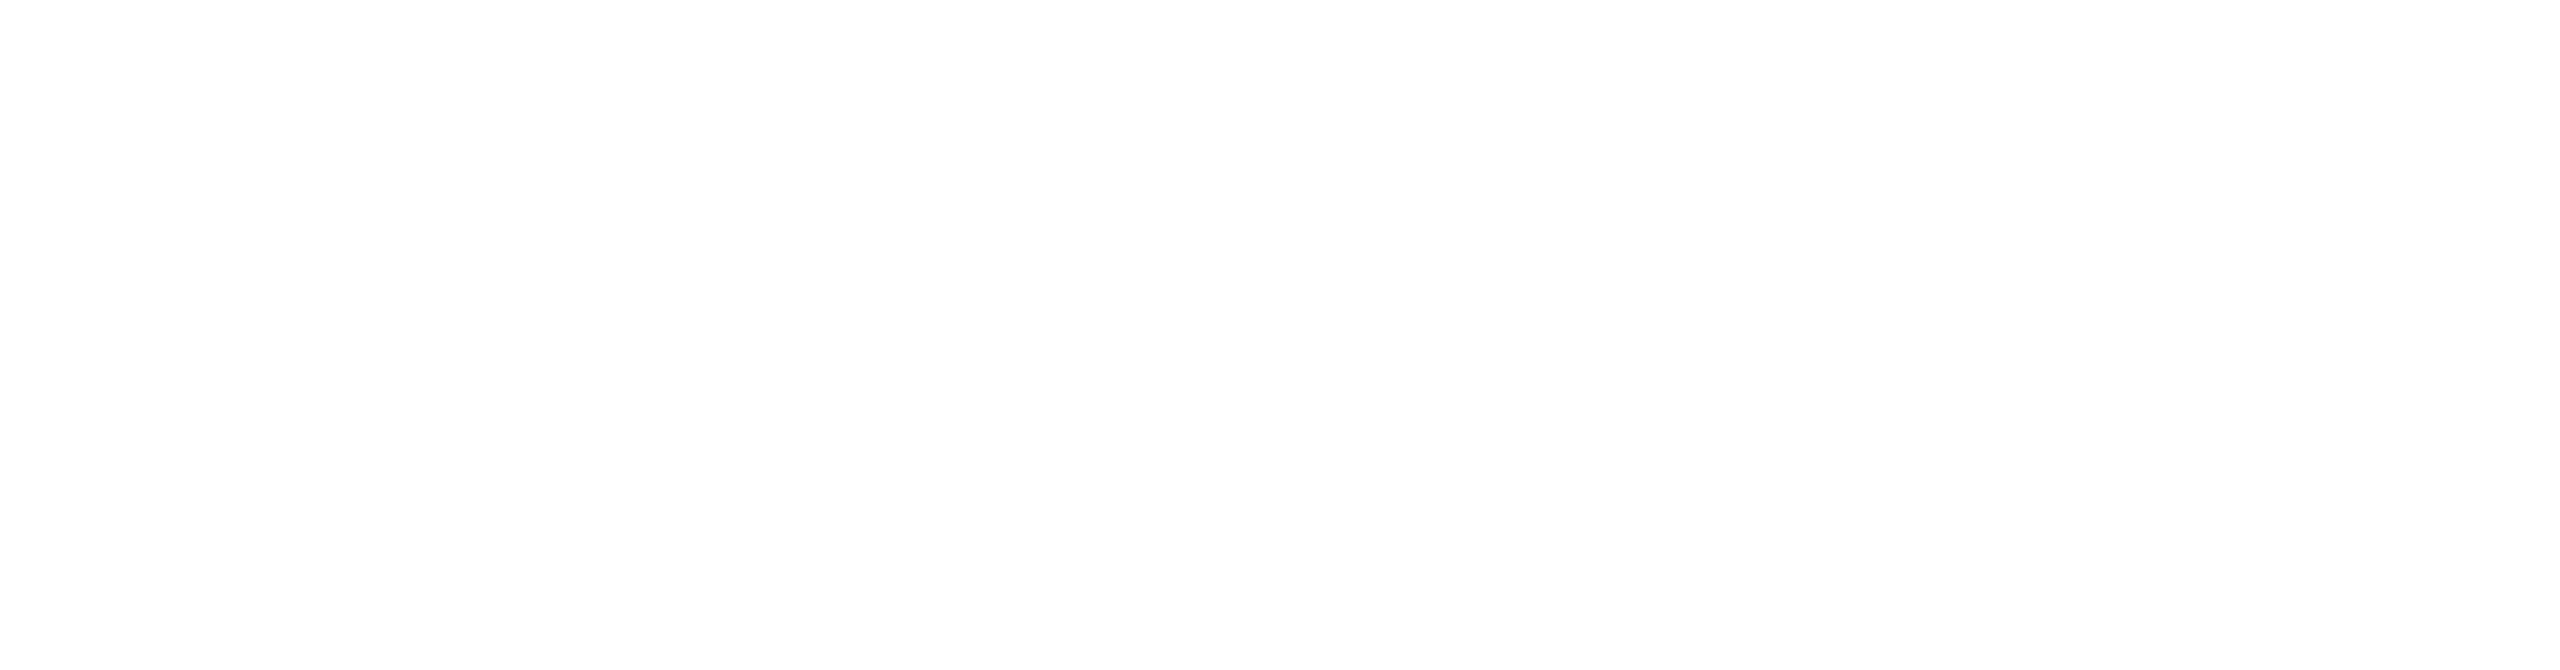 Sivashakti